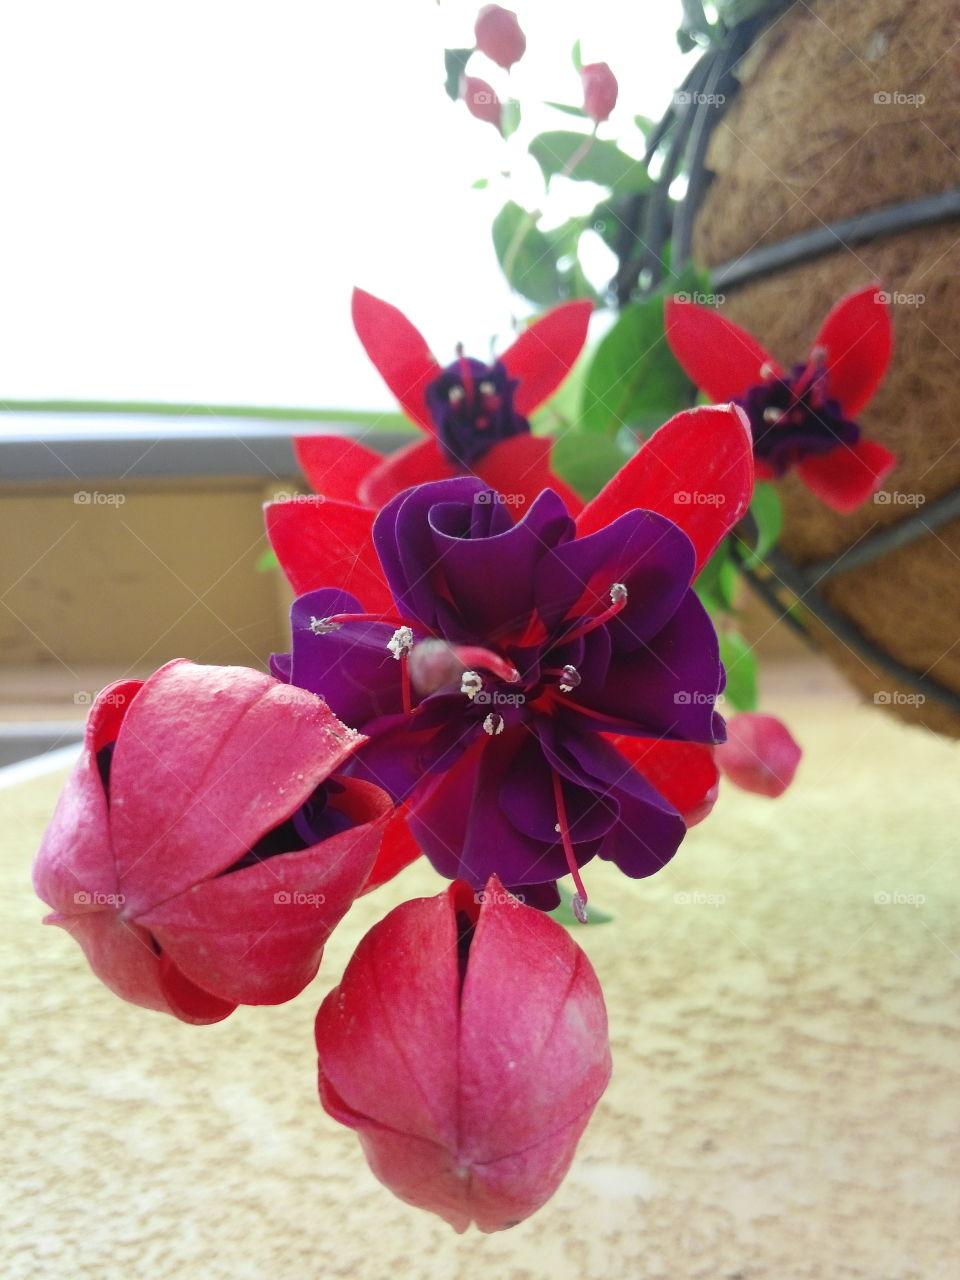 Fuchsia  flowers from bottom